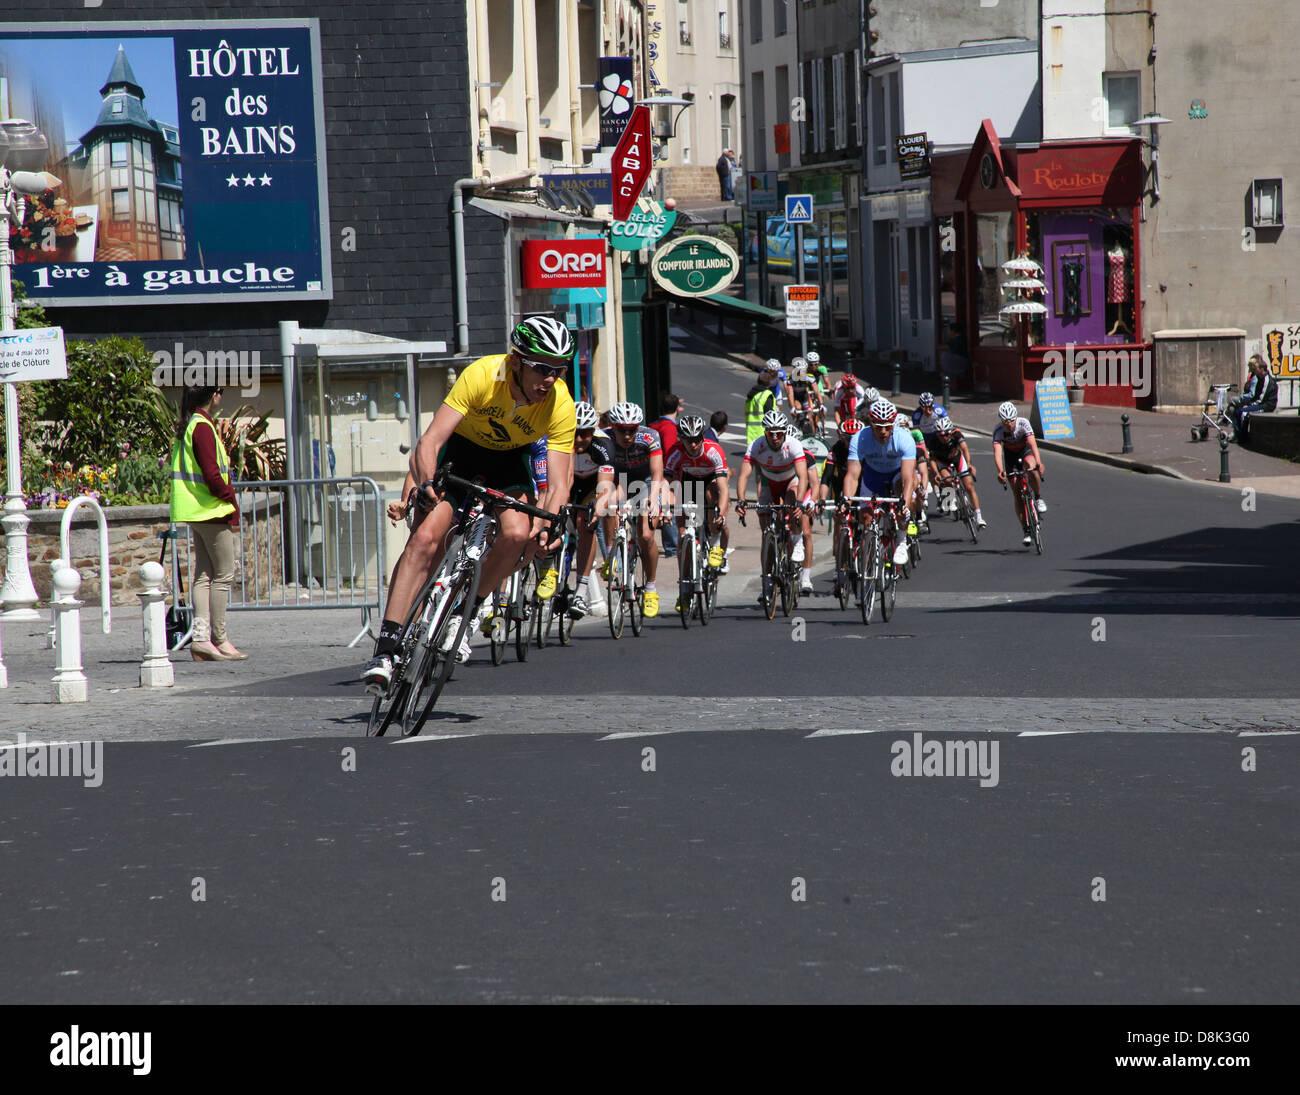 Tour De La Manche Cycliste - A bicycle race in Granville, Normandy, France in 2013. - Stock Image